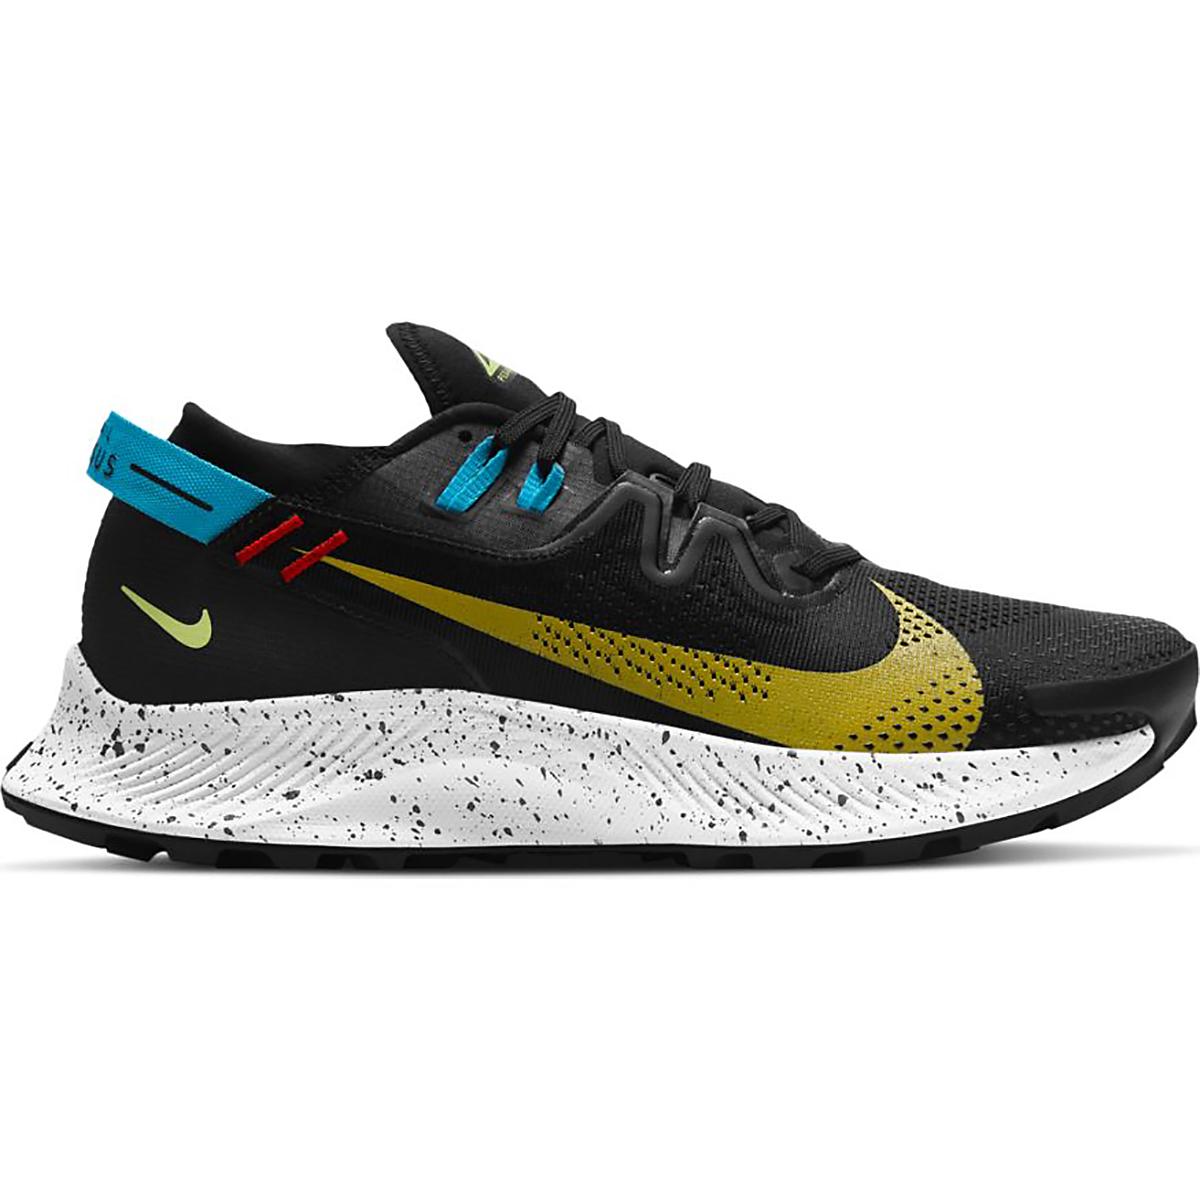 Men's Nike Pegasus Trail 2 Trail Running Shoe - Color: Black/Dark Sulfur-Off Noir-Chile Red - Size: 6 - Width: Regular, Black/Dark Sulfur-Off Noir-Chile Red, large, image 1